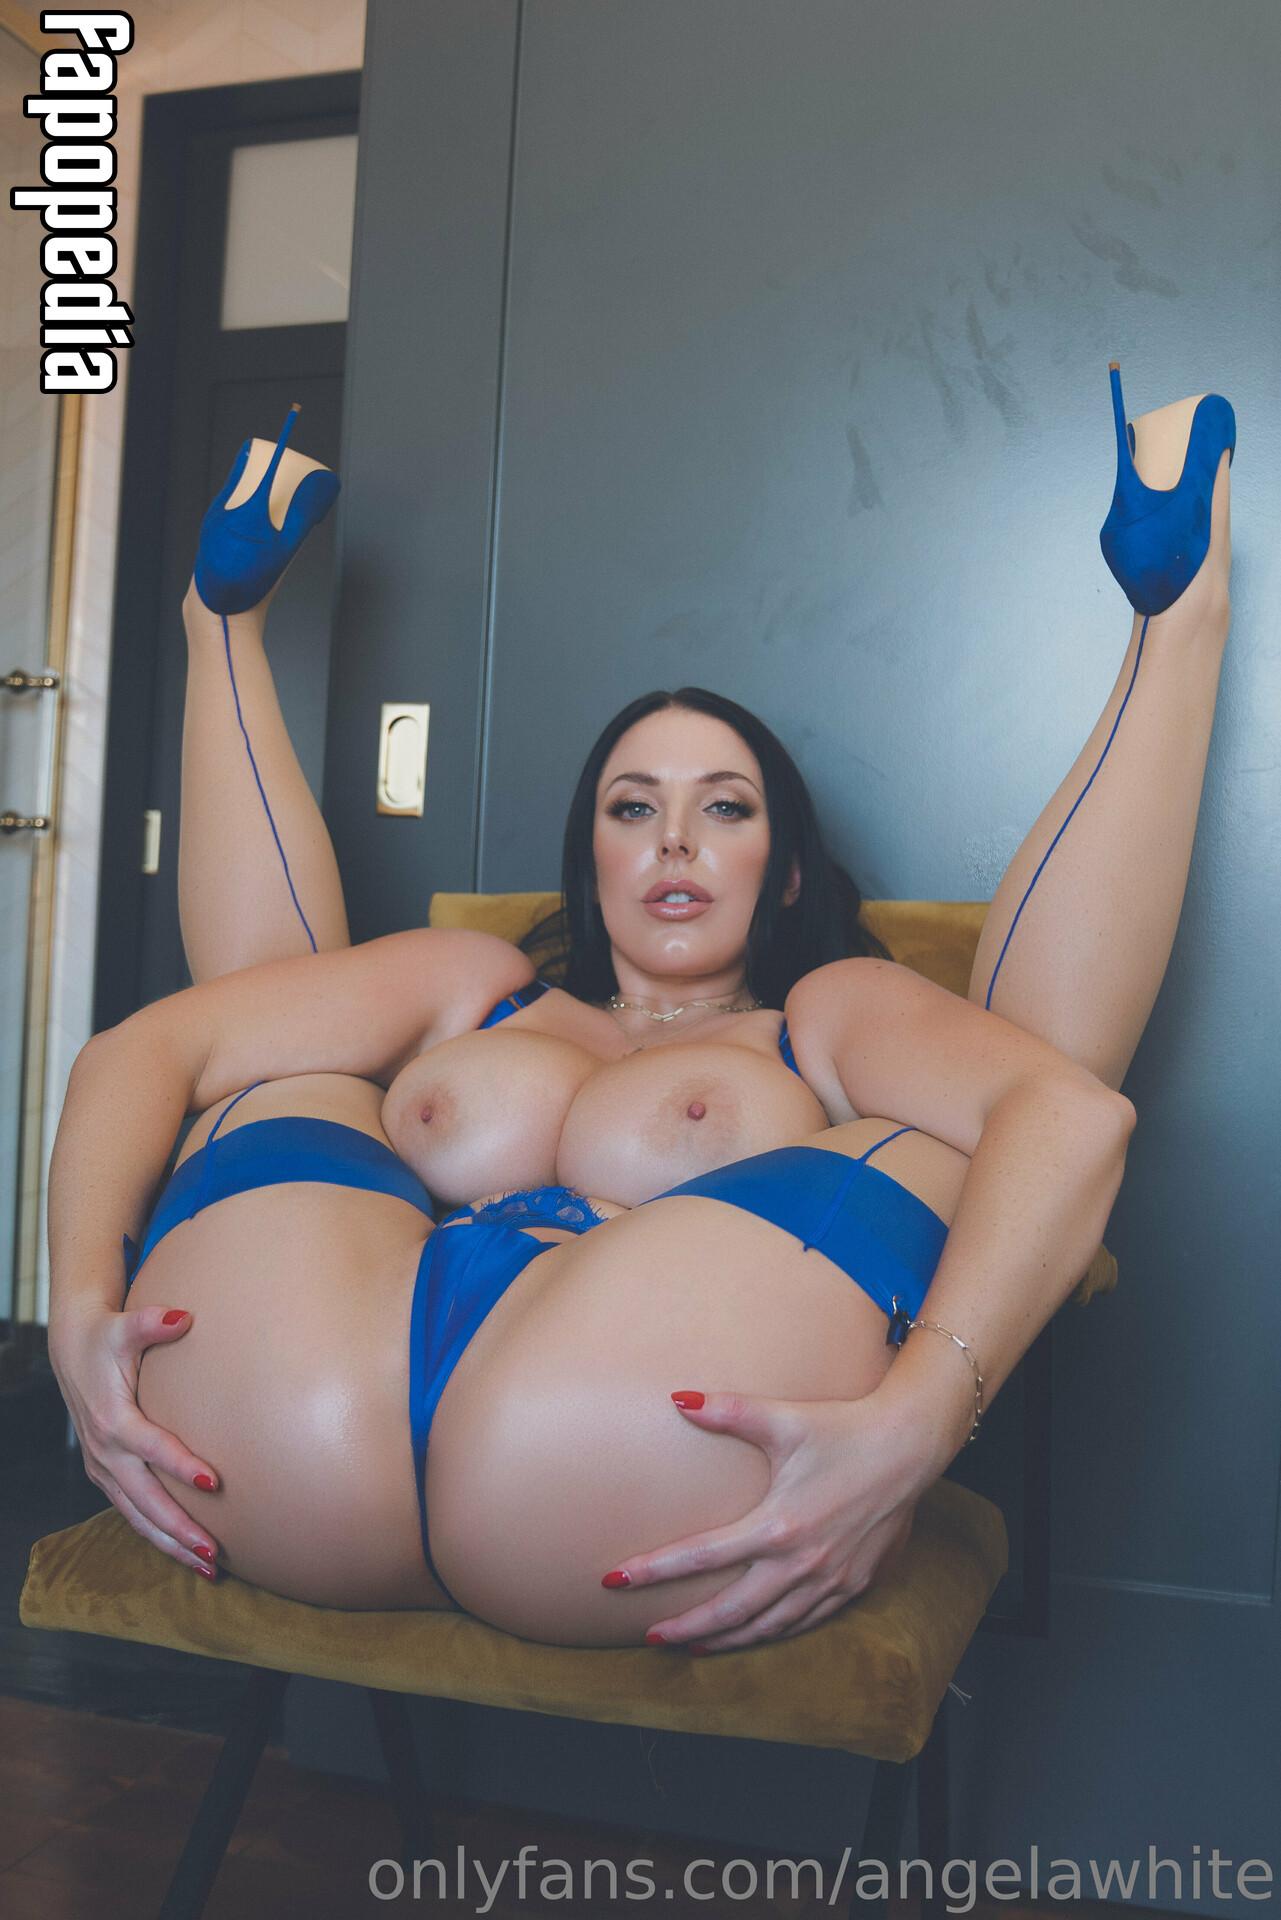 Angela White Nude OnlyFans Leaks